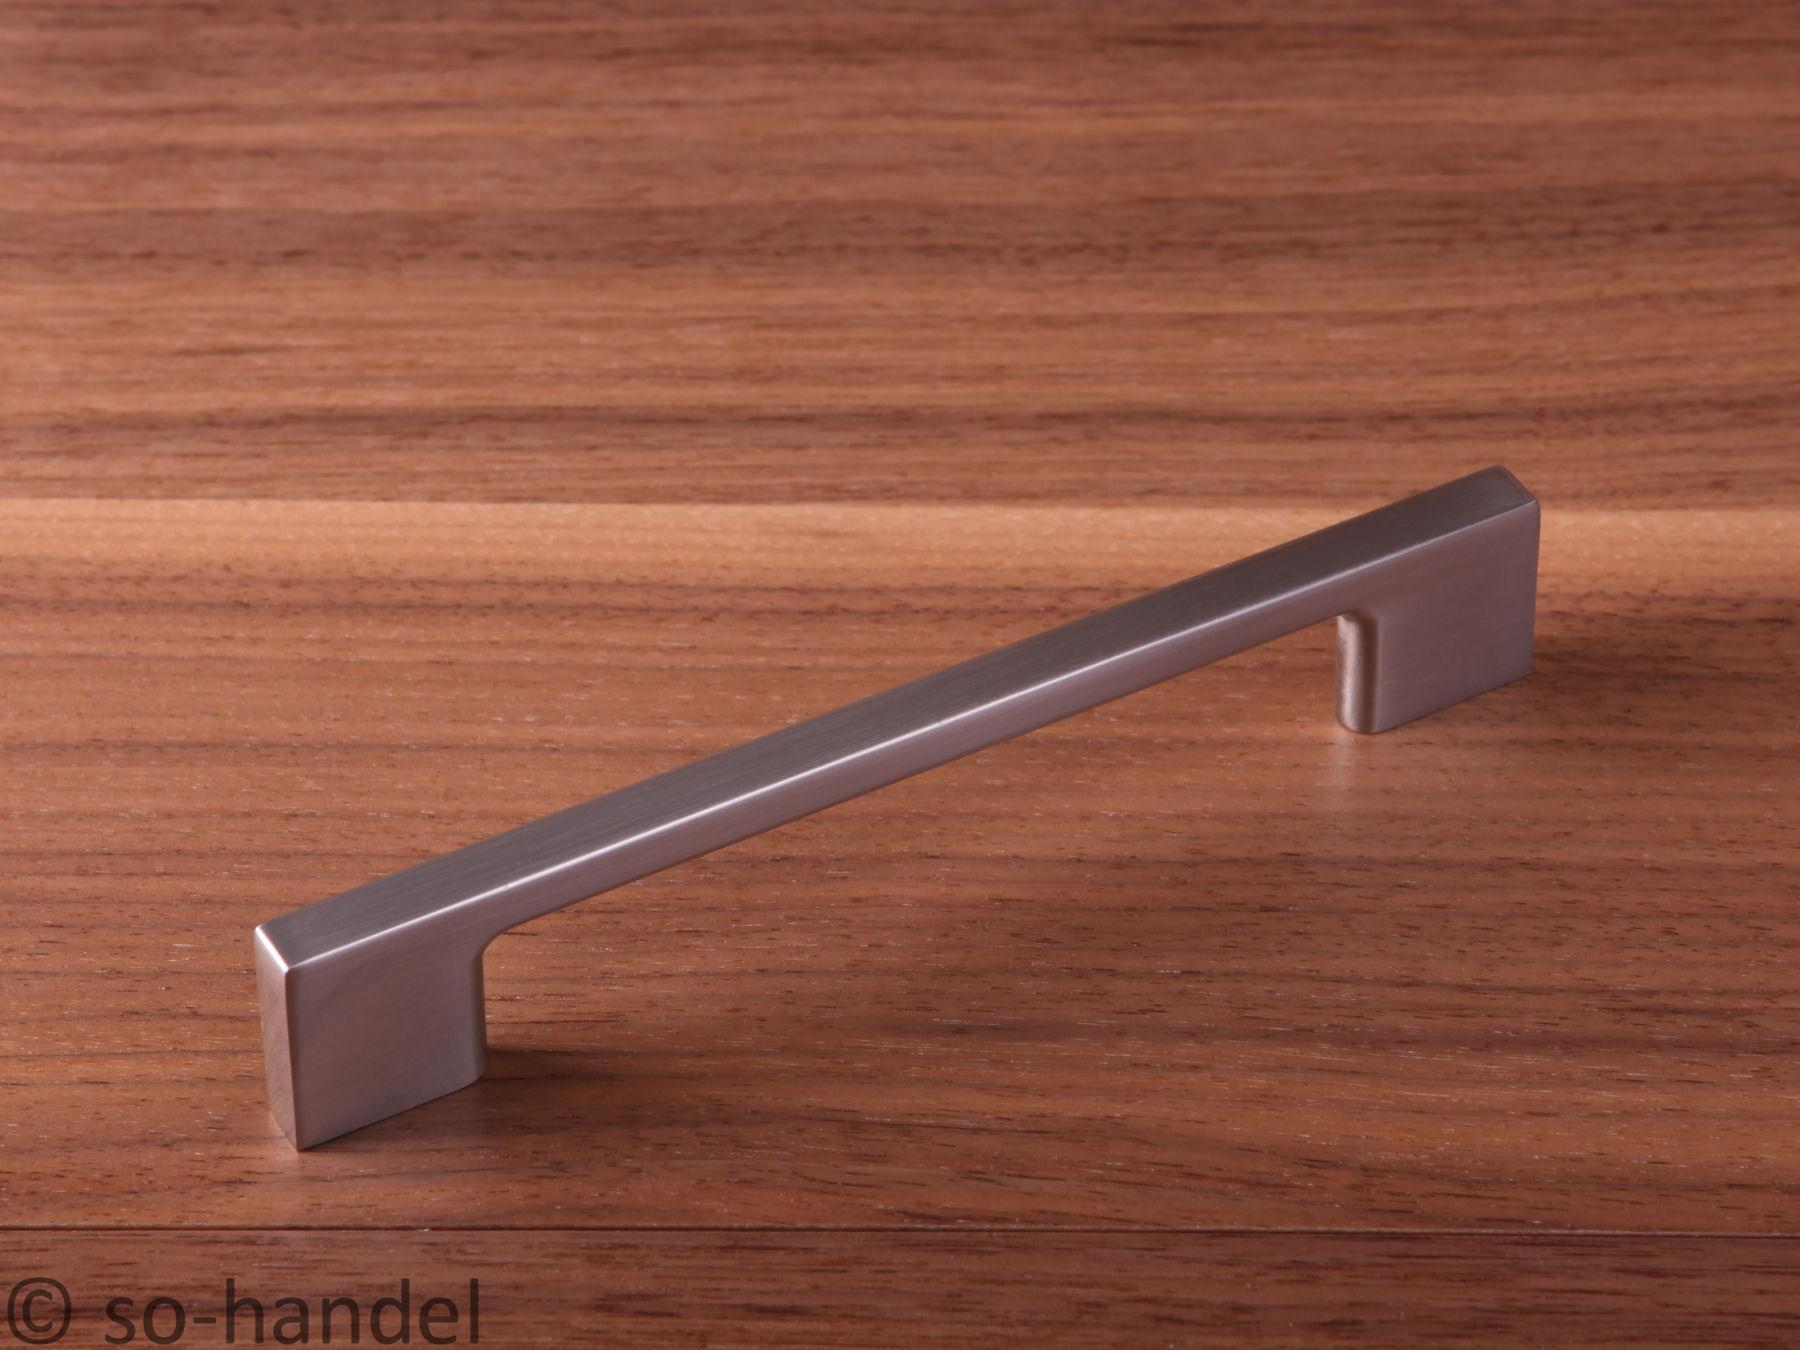 M belgriffe in edelstahl fi 128 mm schrankgriffe for Mobelgriffe edelstahl 128 mm